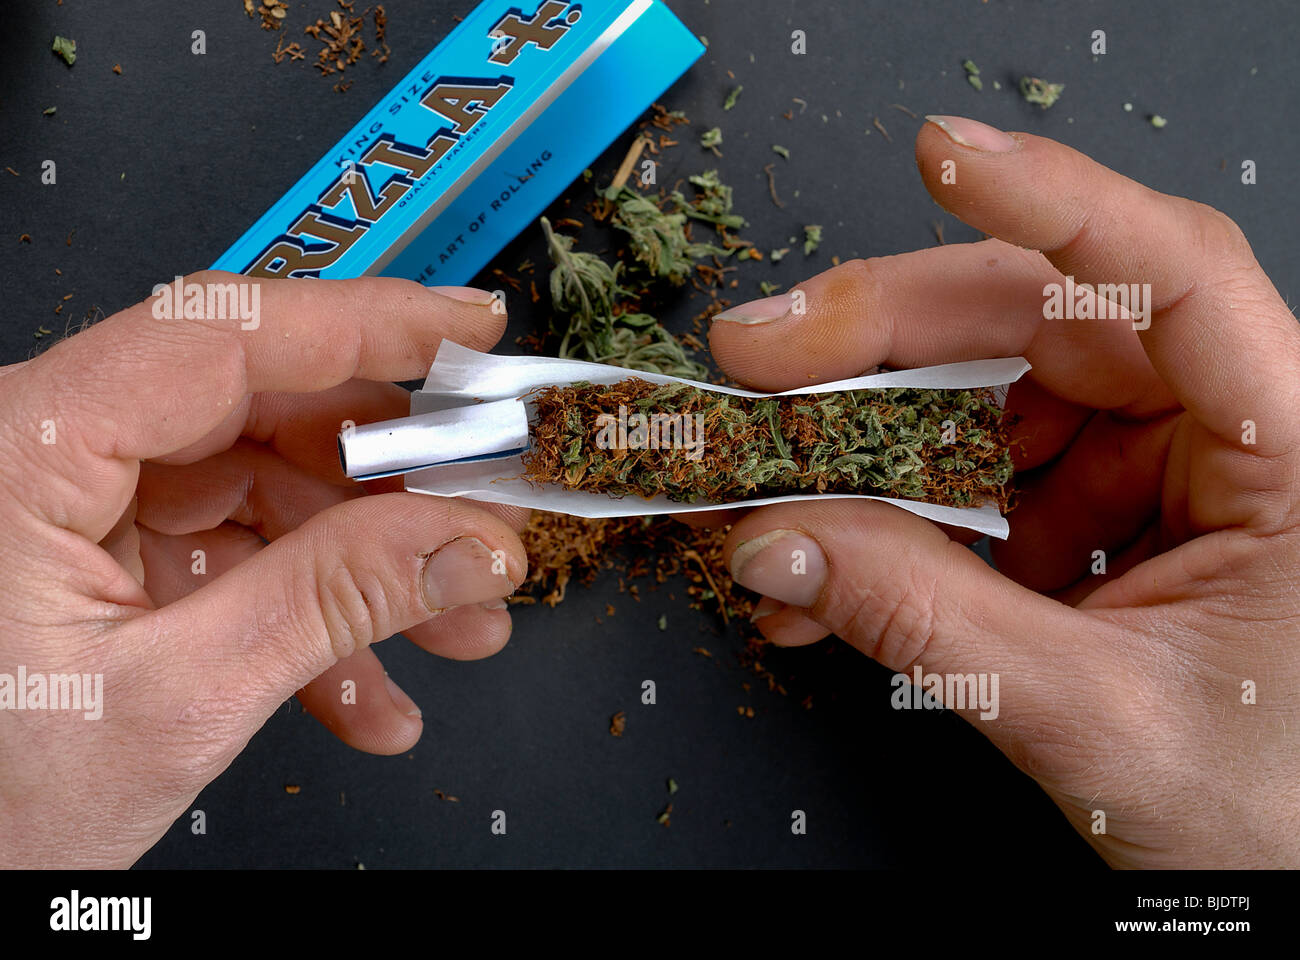 ****-de-****-que-se-esta-implantando-reefer-canuto-cigarrillo-de-****-bjdtpj.jpg